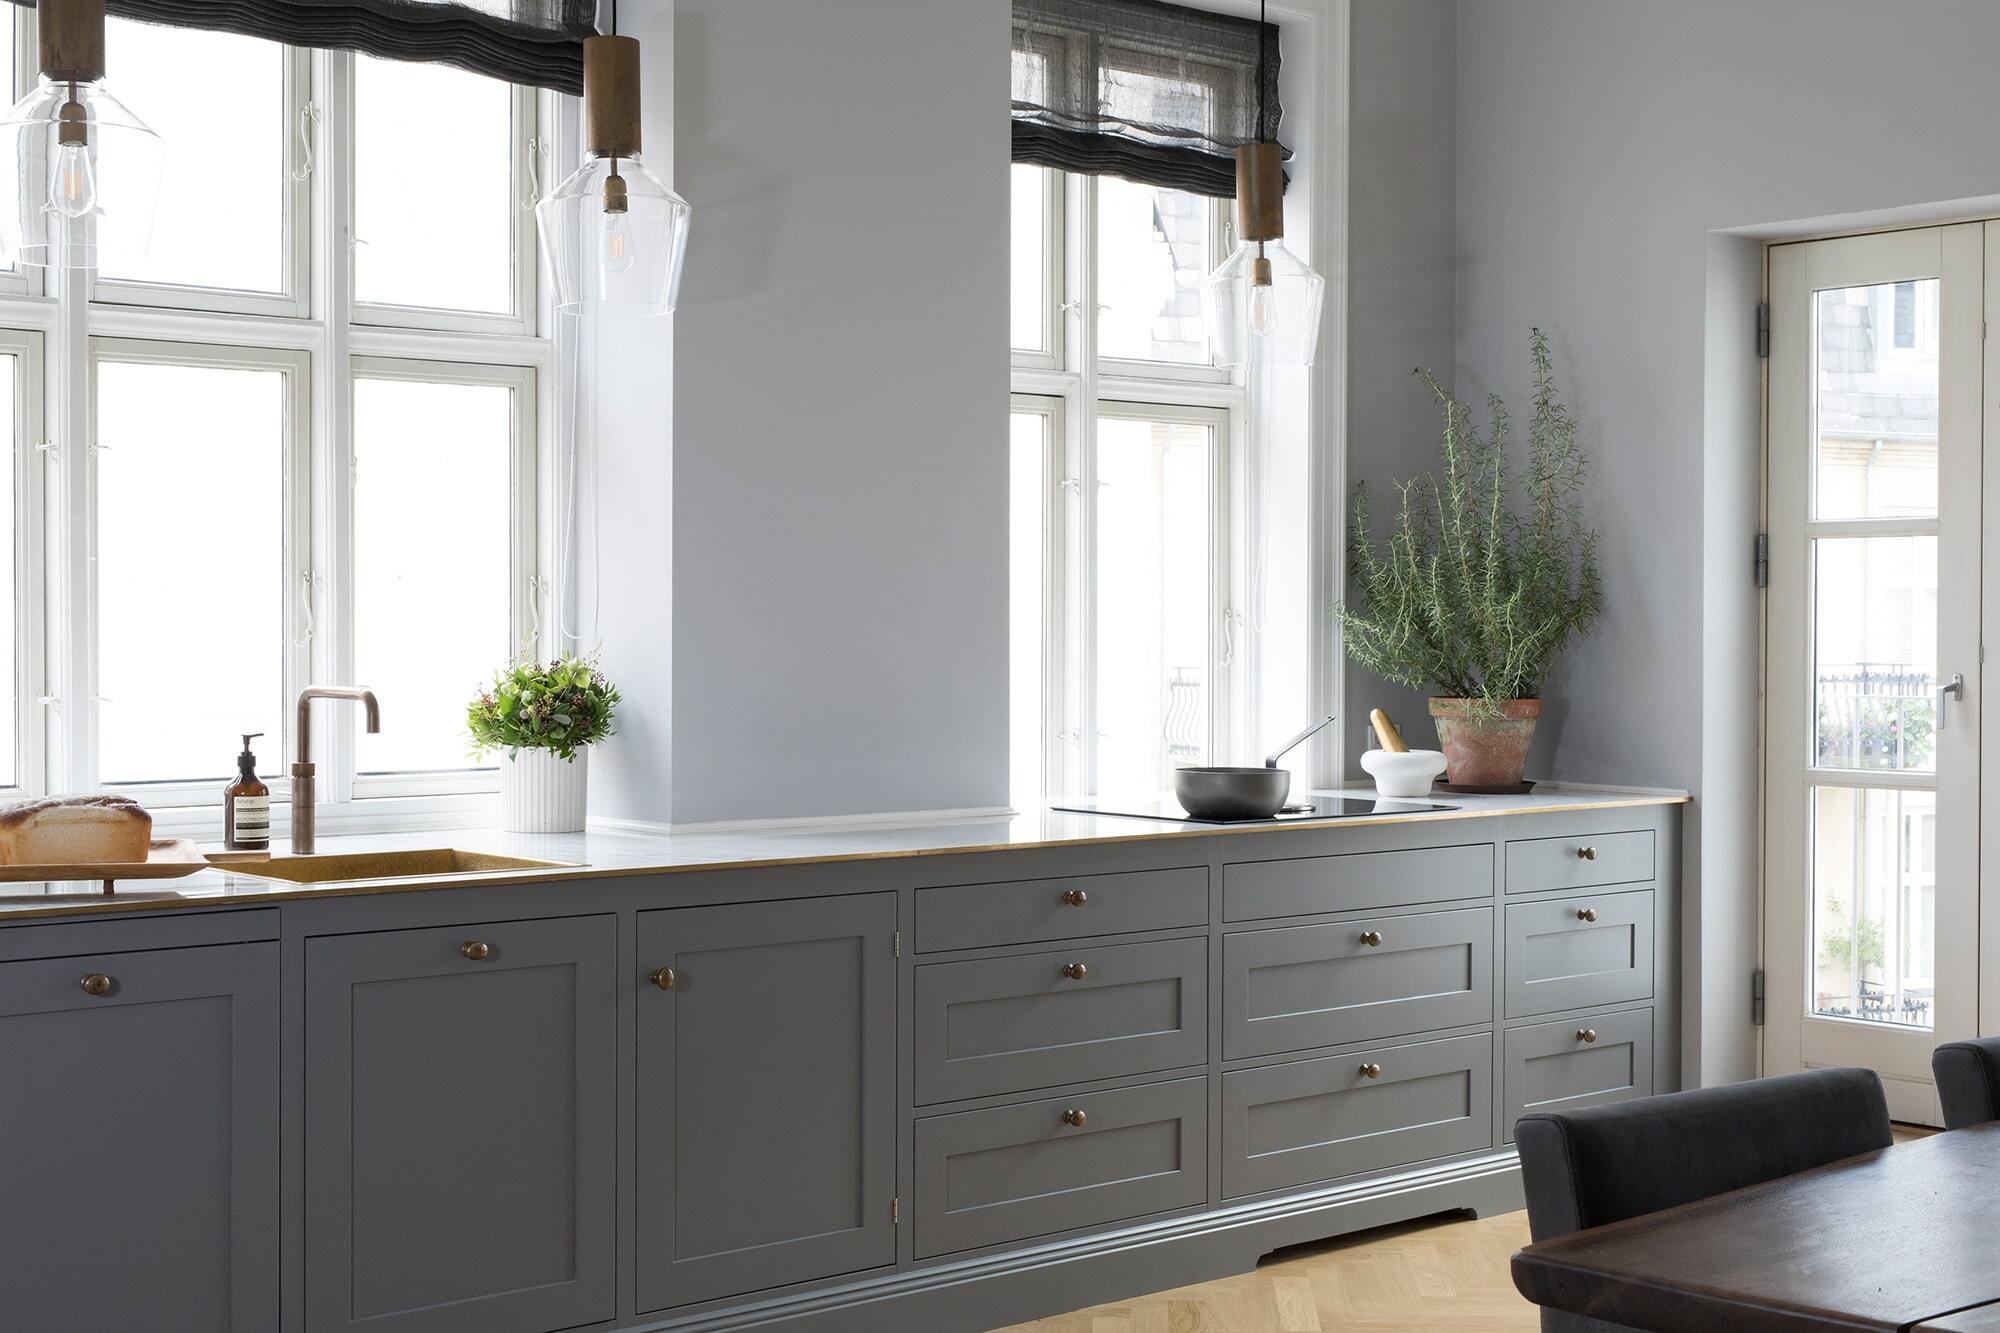 Bespoke Swedish Shaker Kitchen